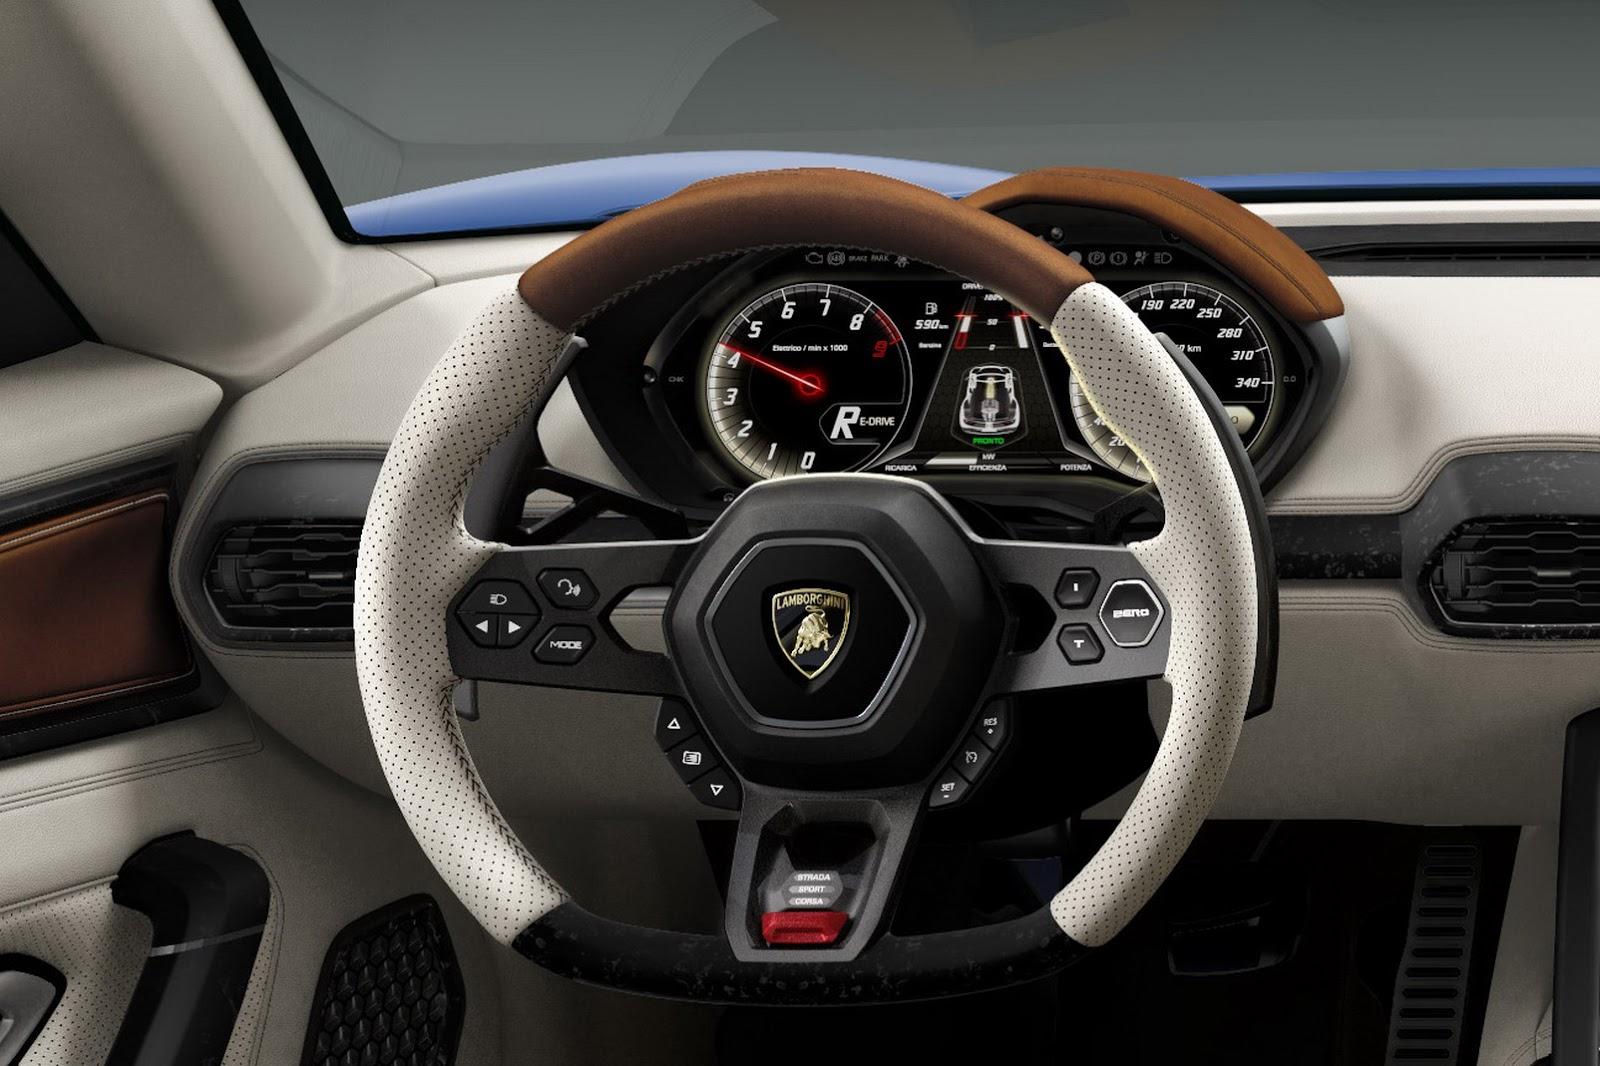 Cars Wallpaper Hd Lambo Ferrari Lamborghini Asterion To Make It Into Production After All